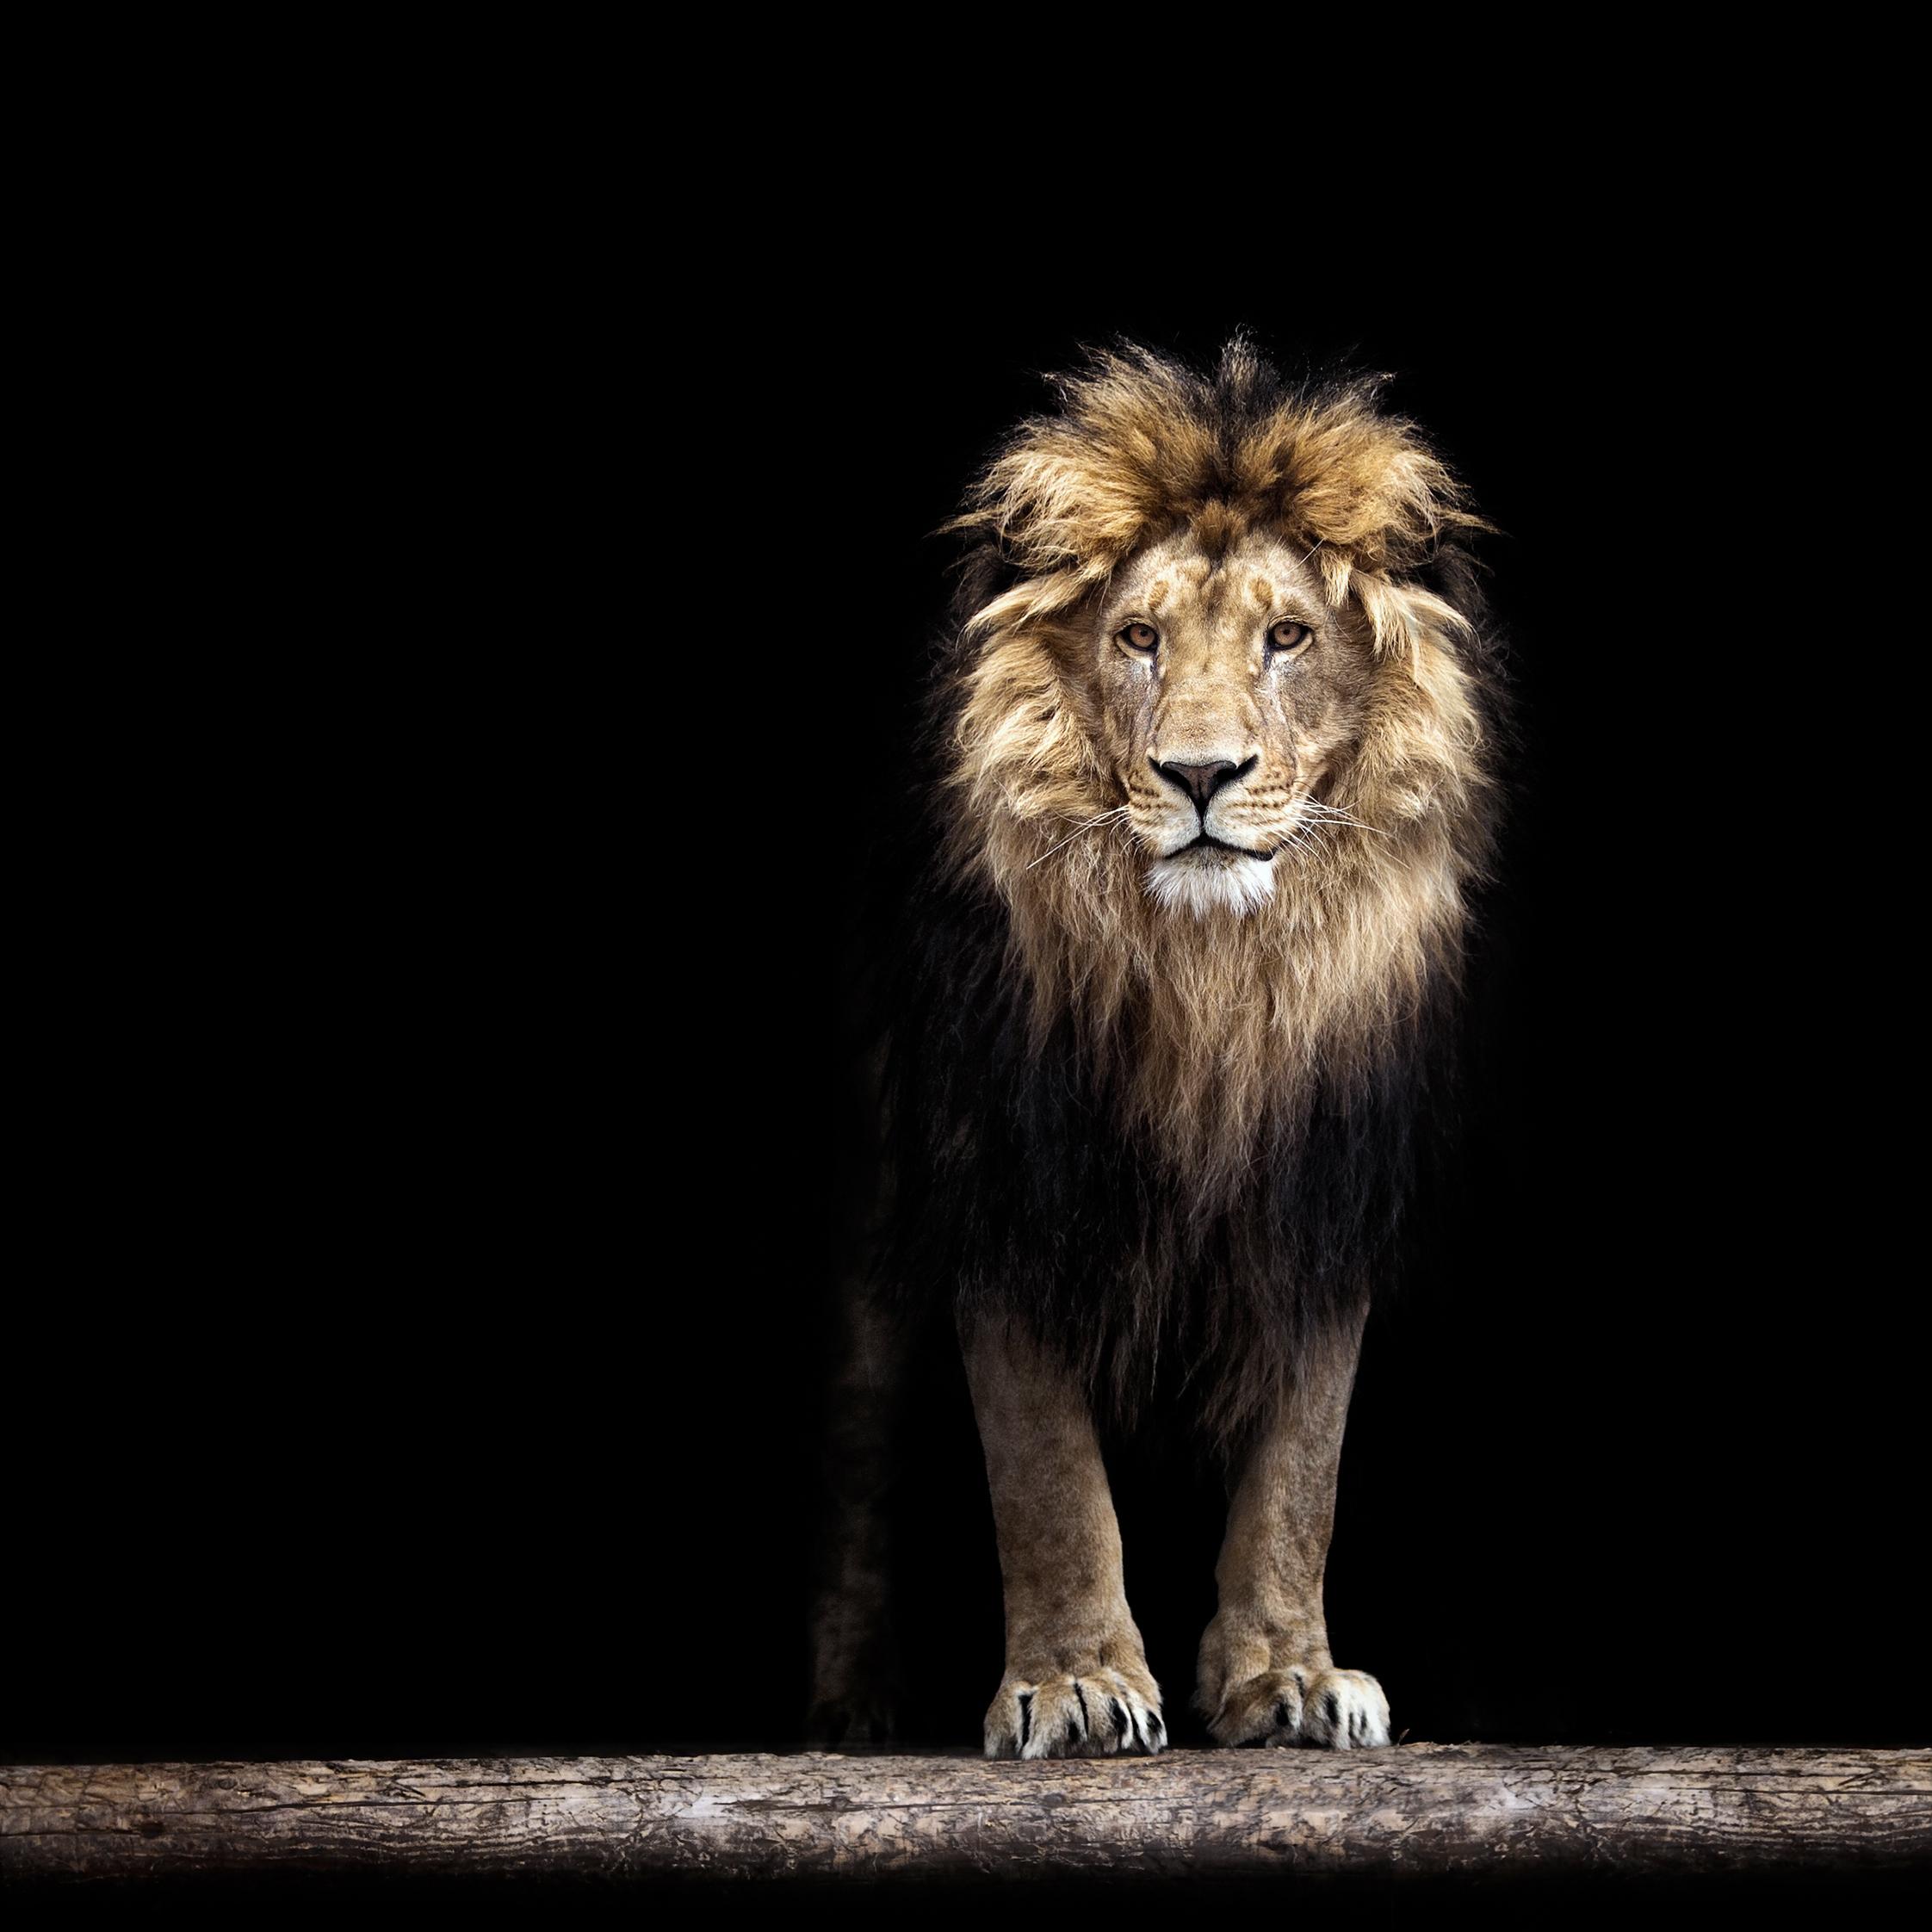 iStock-489629846_Lion.jpg